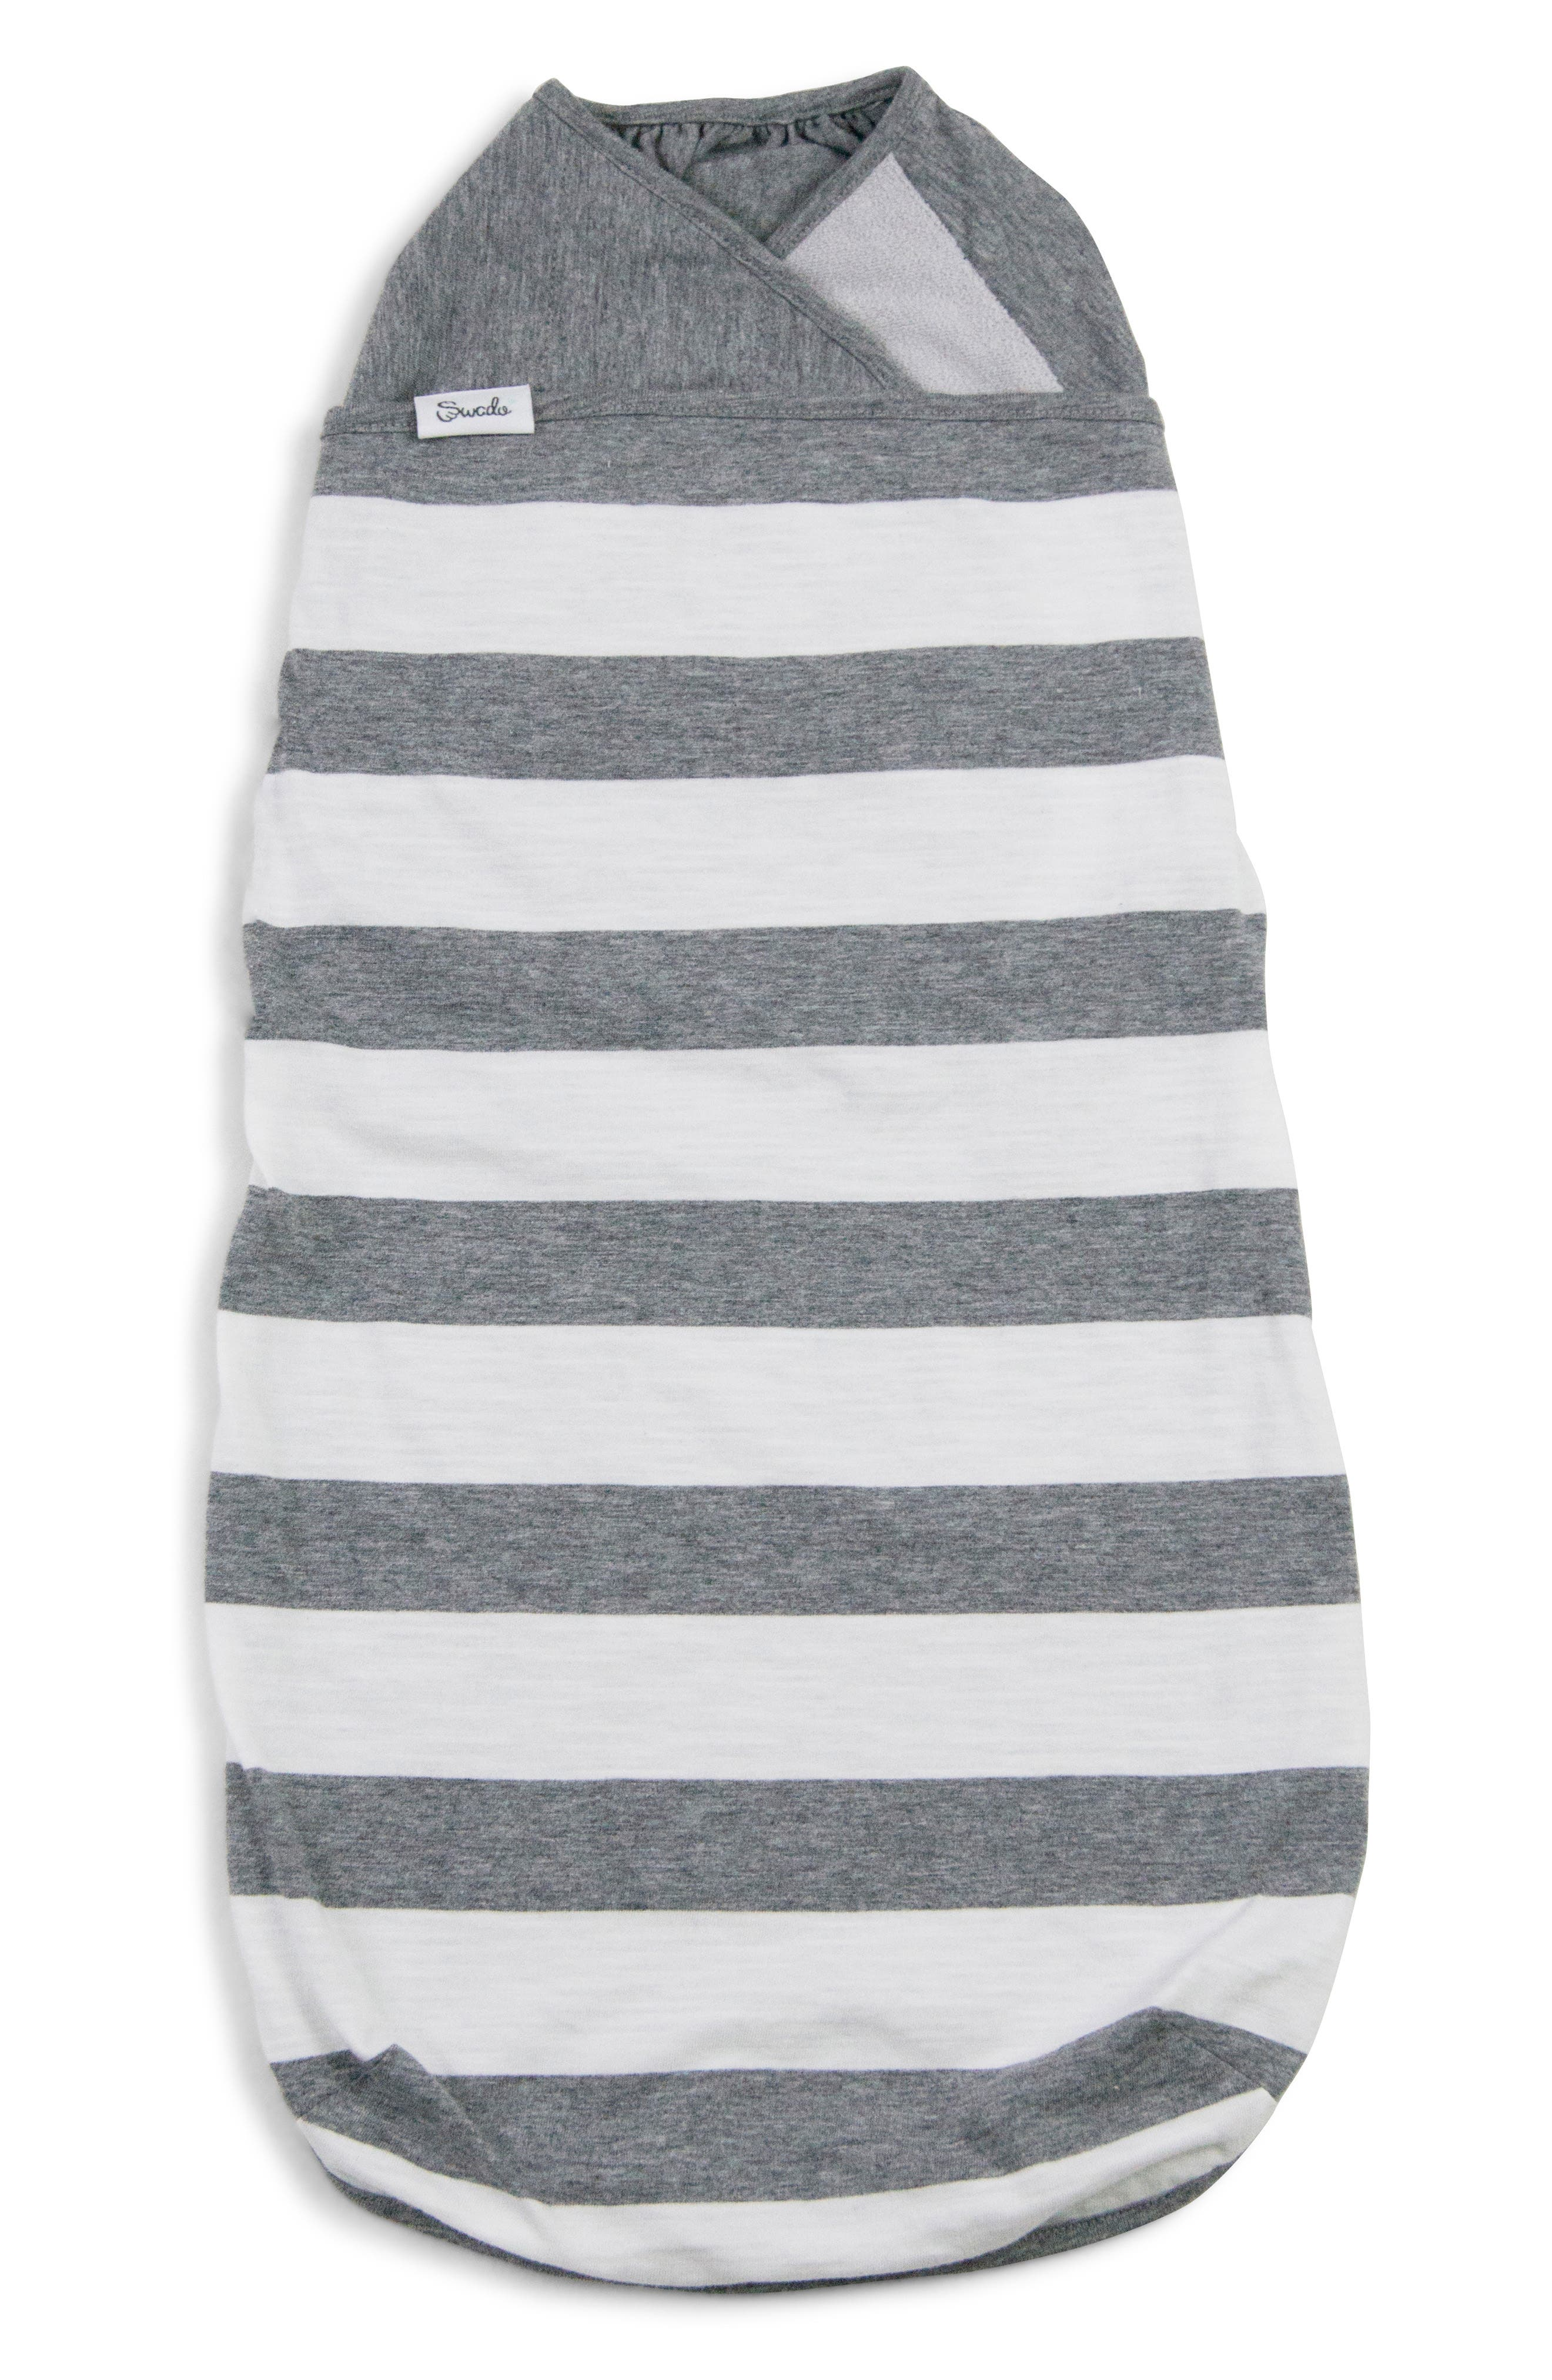 SWADO Stripe Wearable Swaddle, Main, color, GREY/ WHITE STRIPE